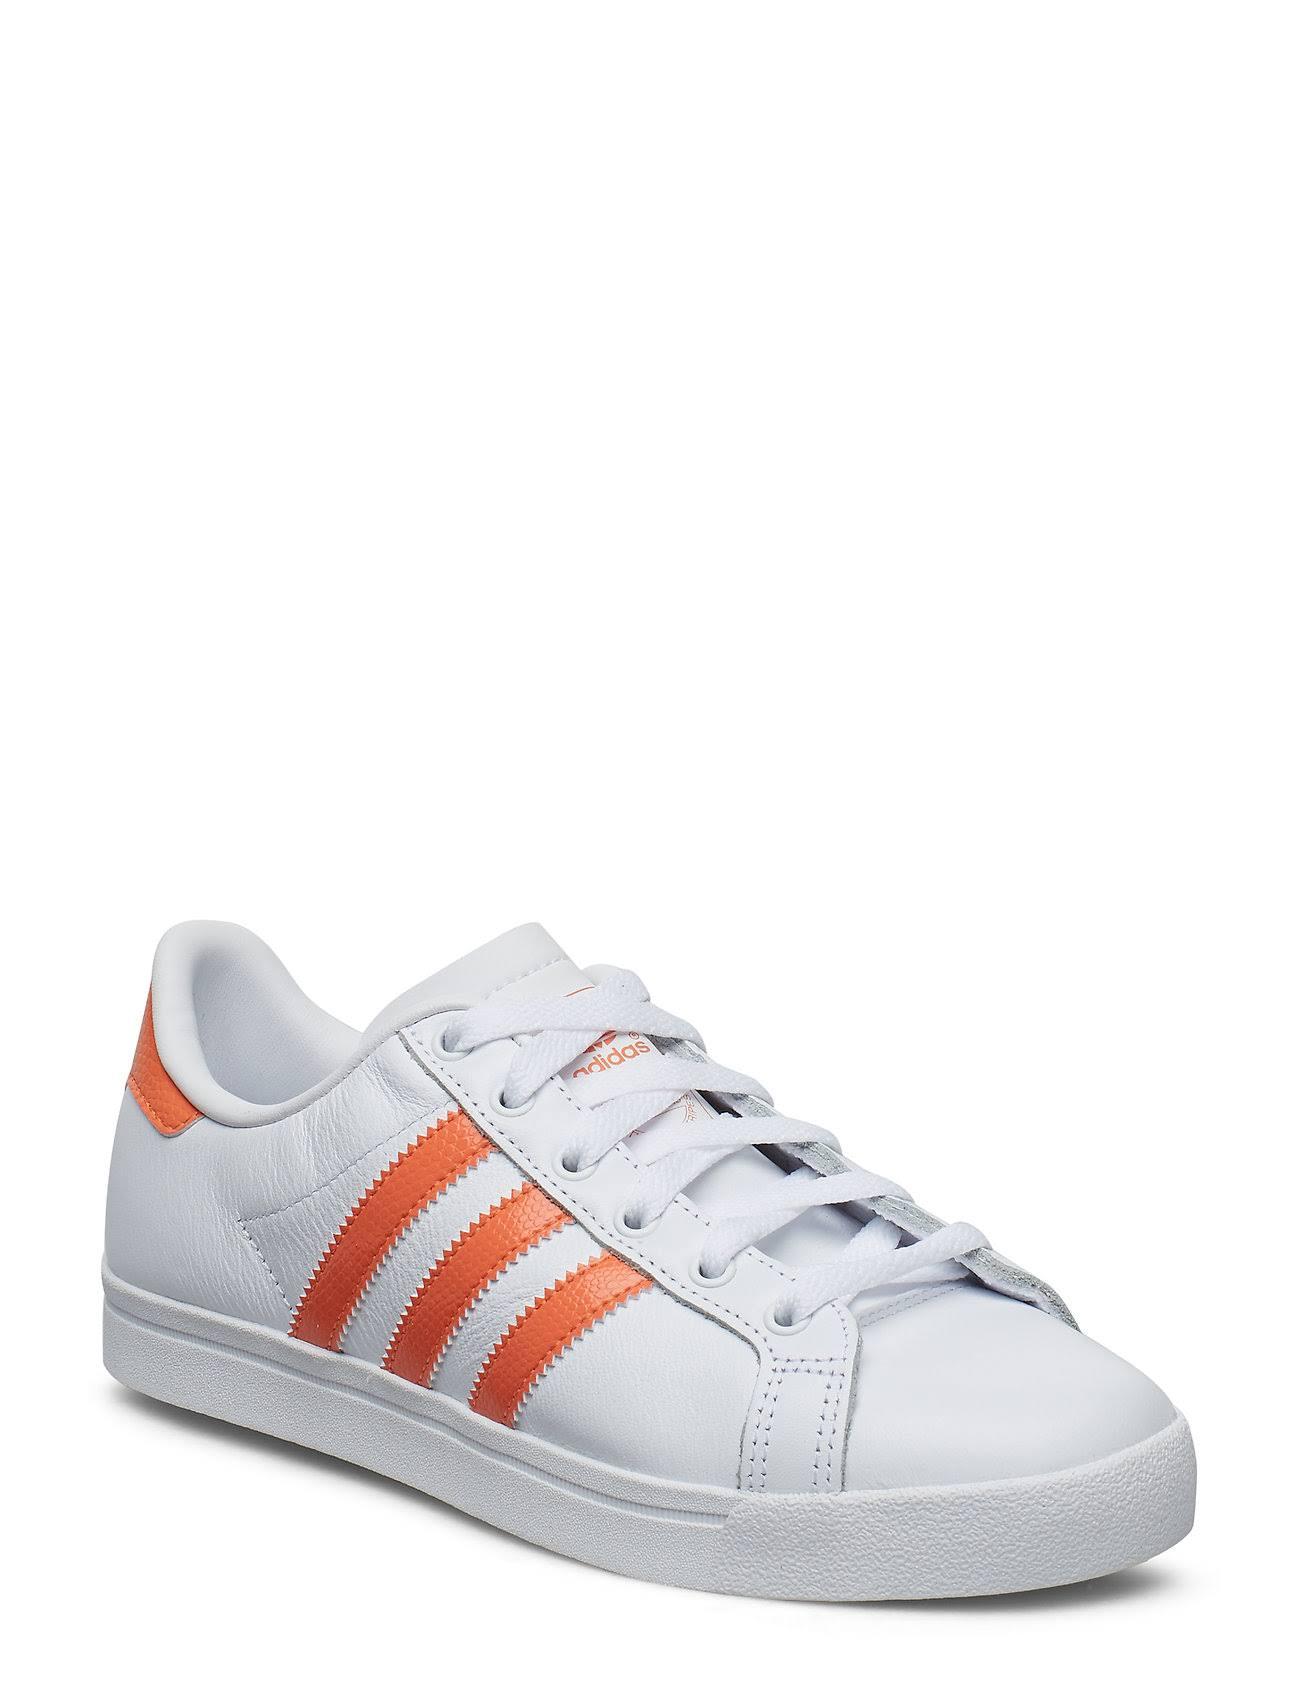 Adidas Originals 'Coast Star' Trainers - White